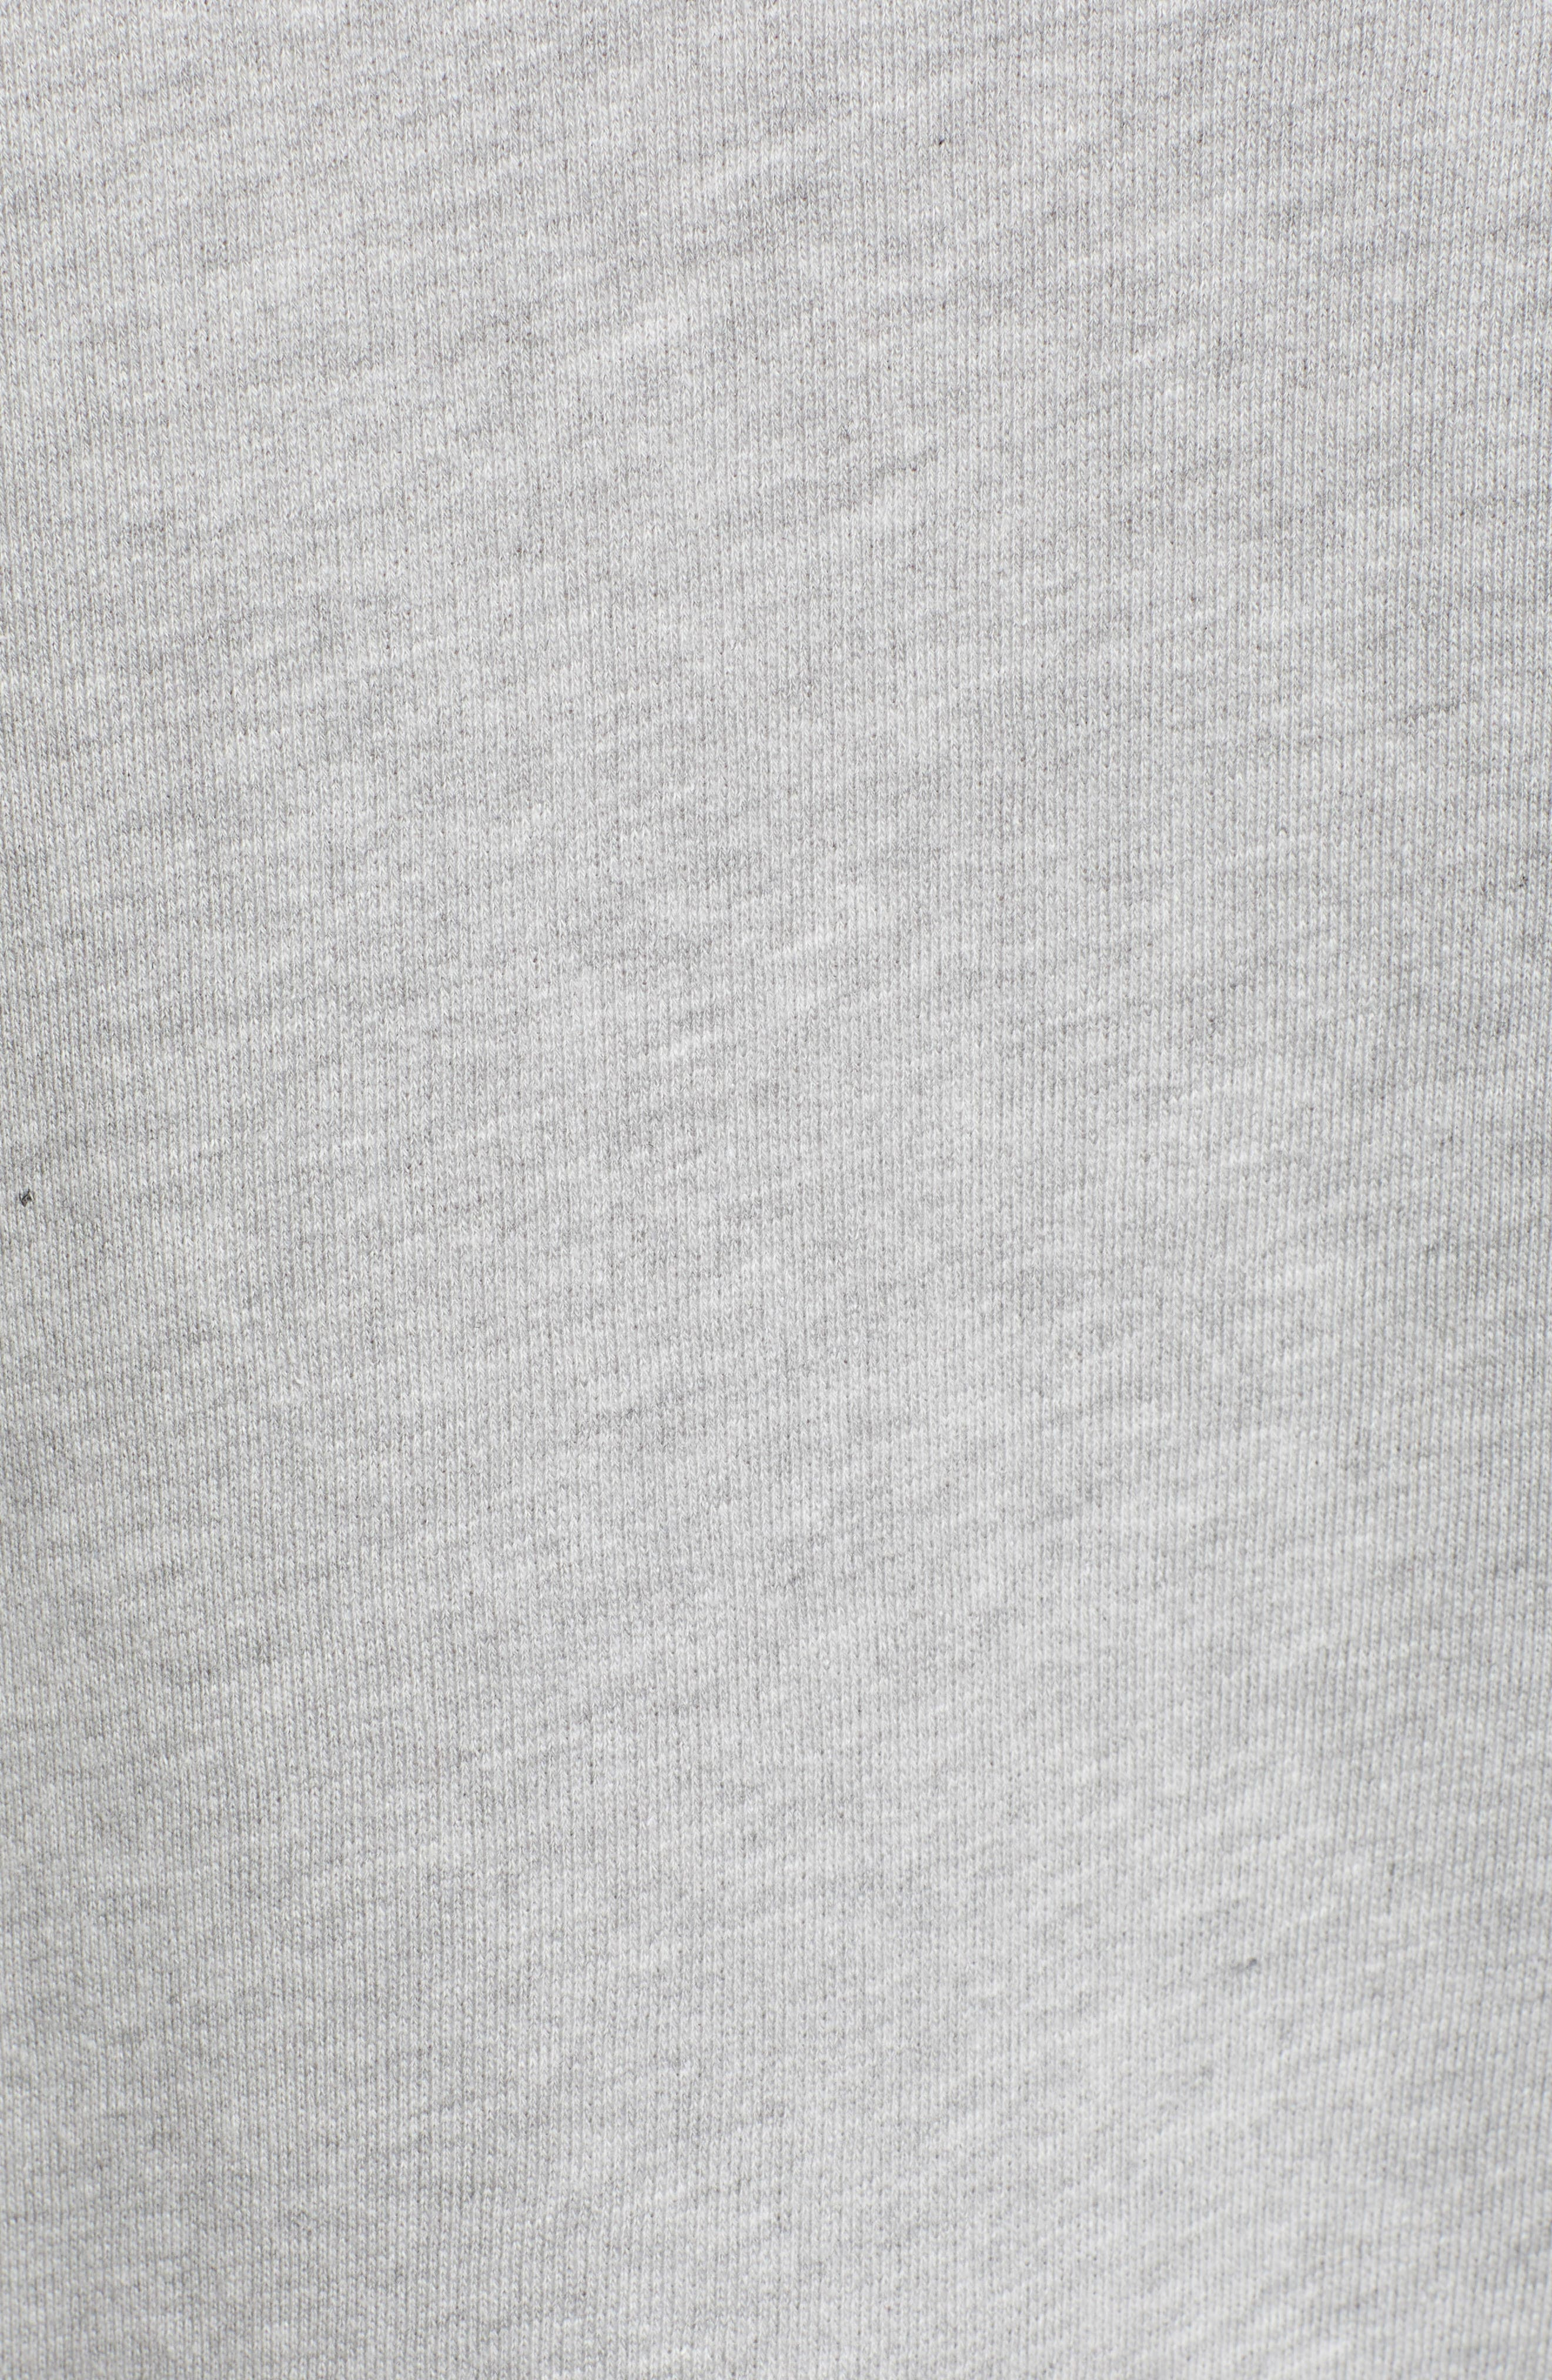 Roadtrip Sweatshirt,                             Alternate thumbnail 5, color,                             HEATHER